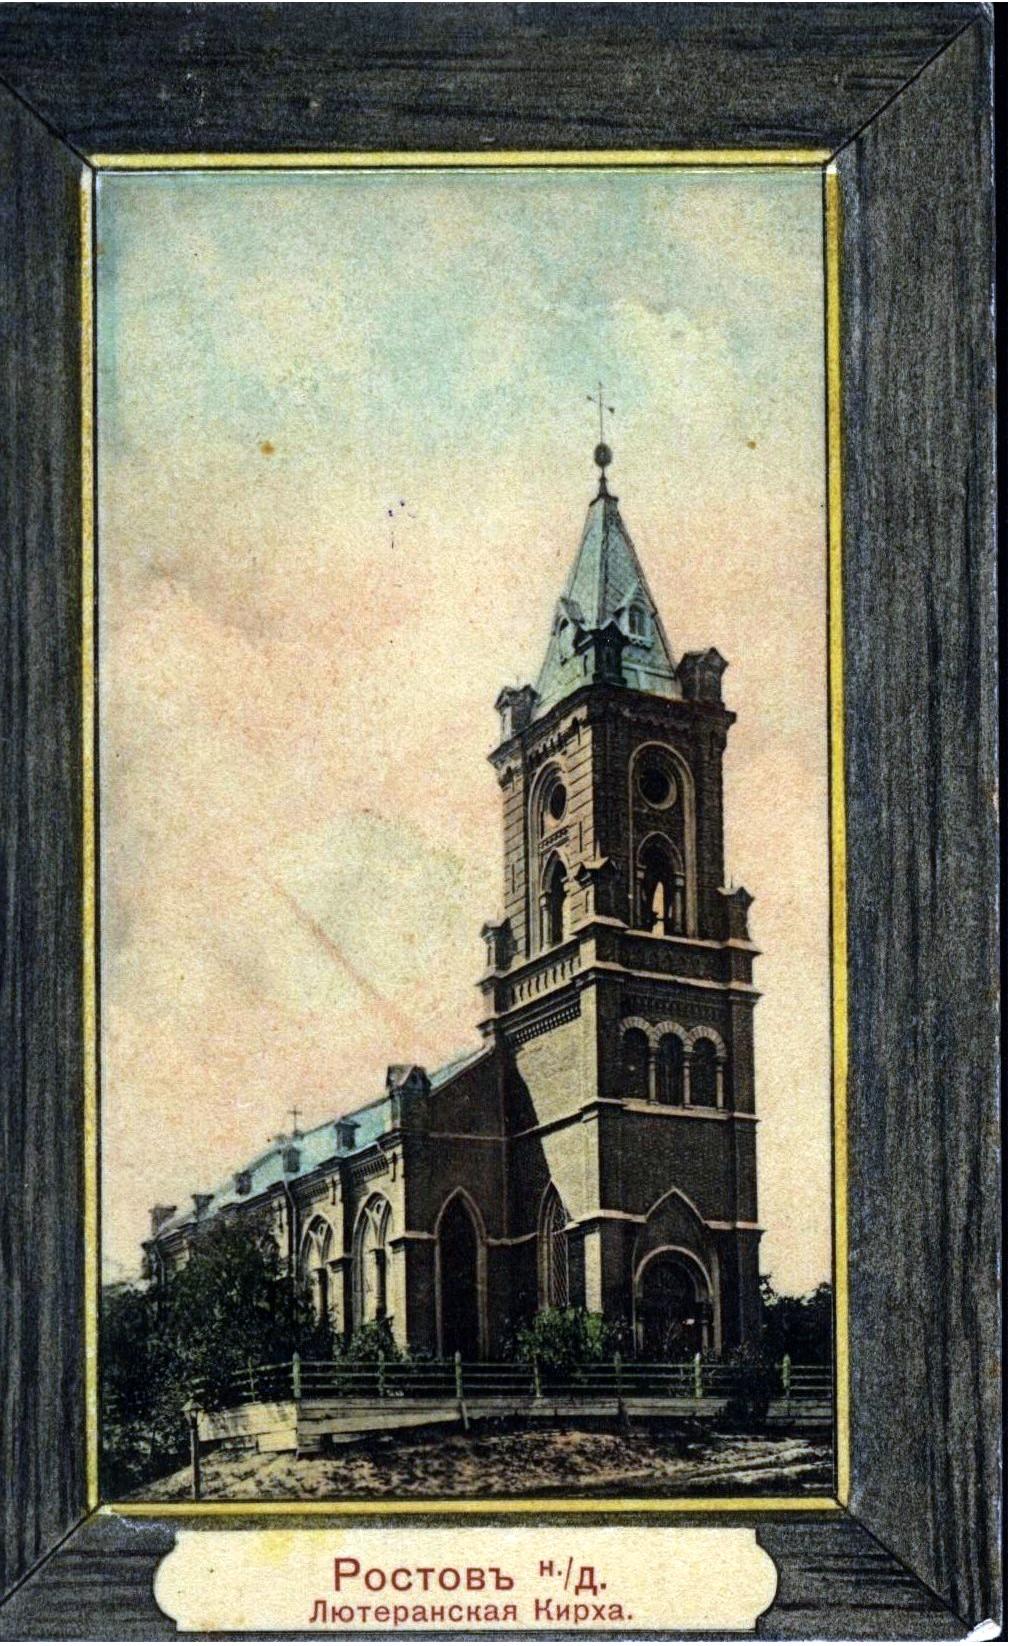 Лютеранская кирха. Зеленая рамка